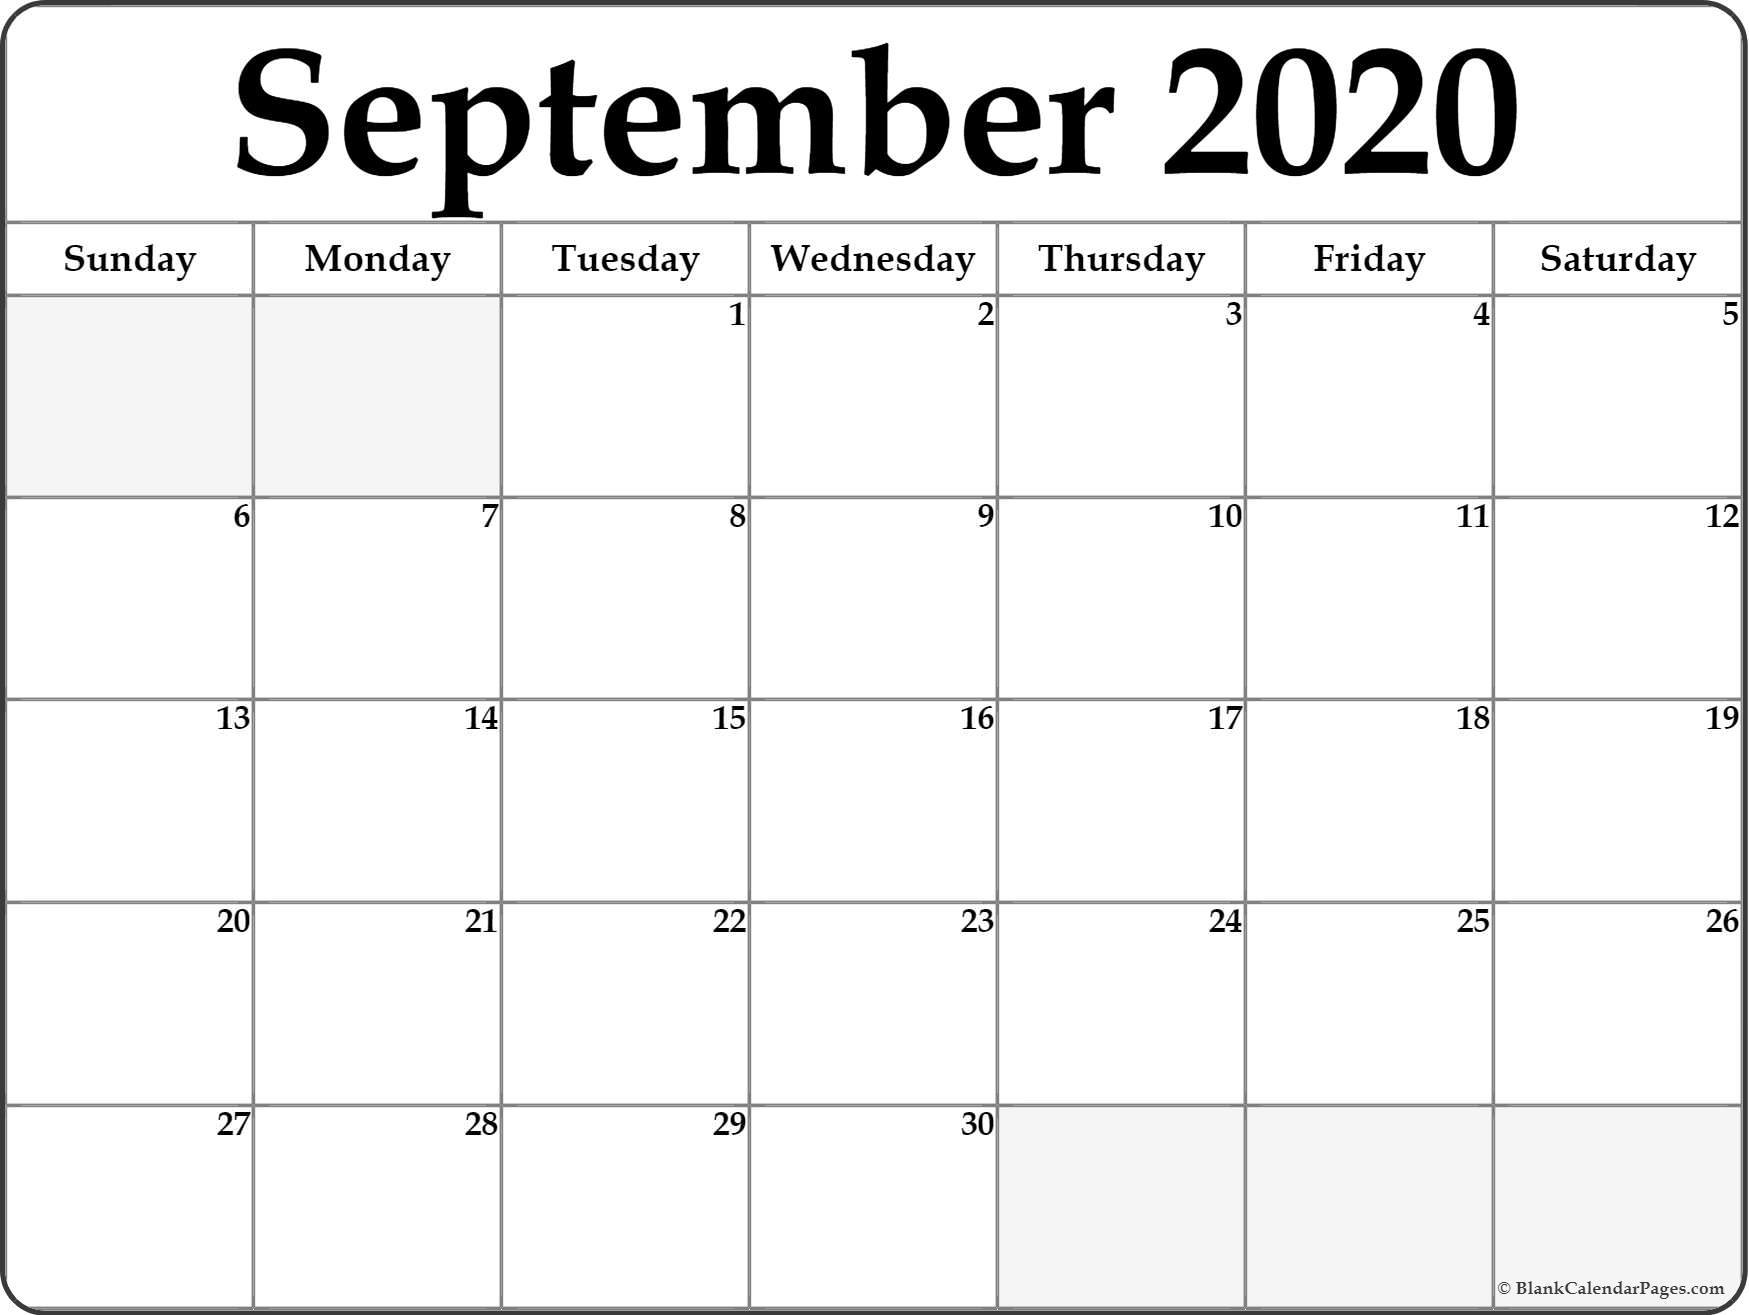 September 2020 Calendar | Free Printable Monthly Calendars inside Printable Blank Calendar Pages For September